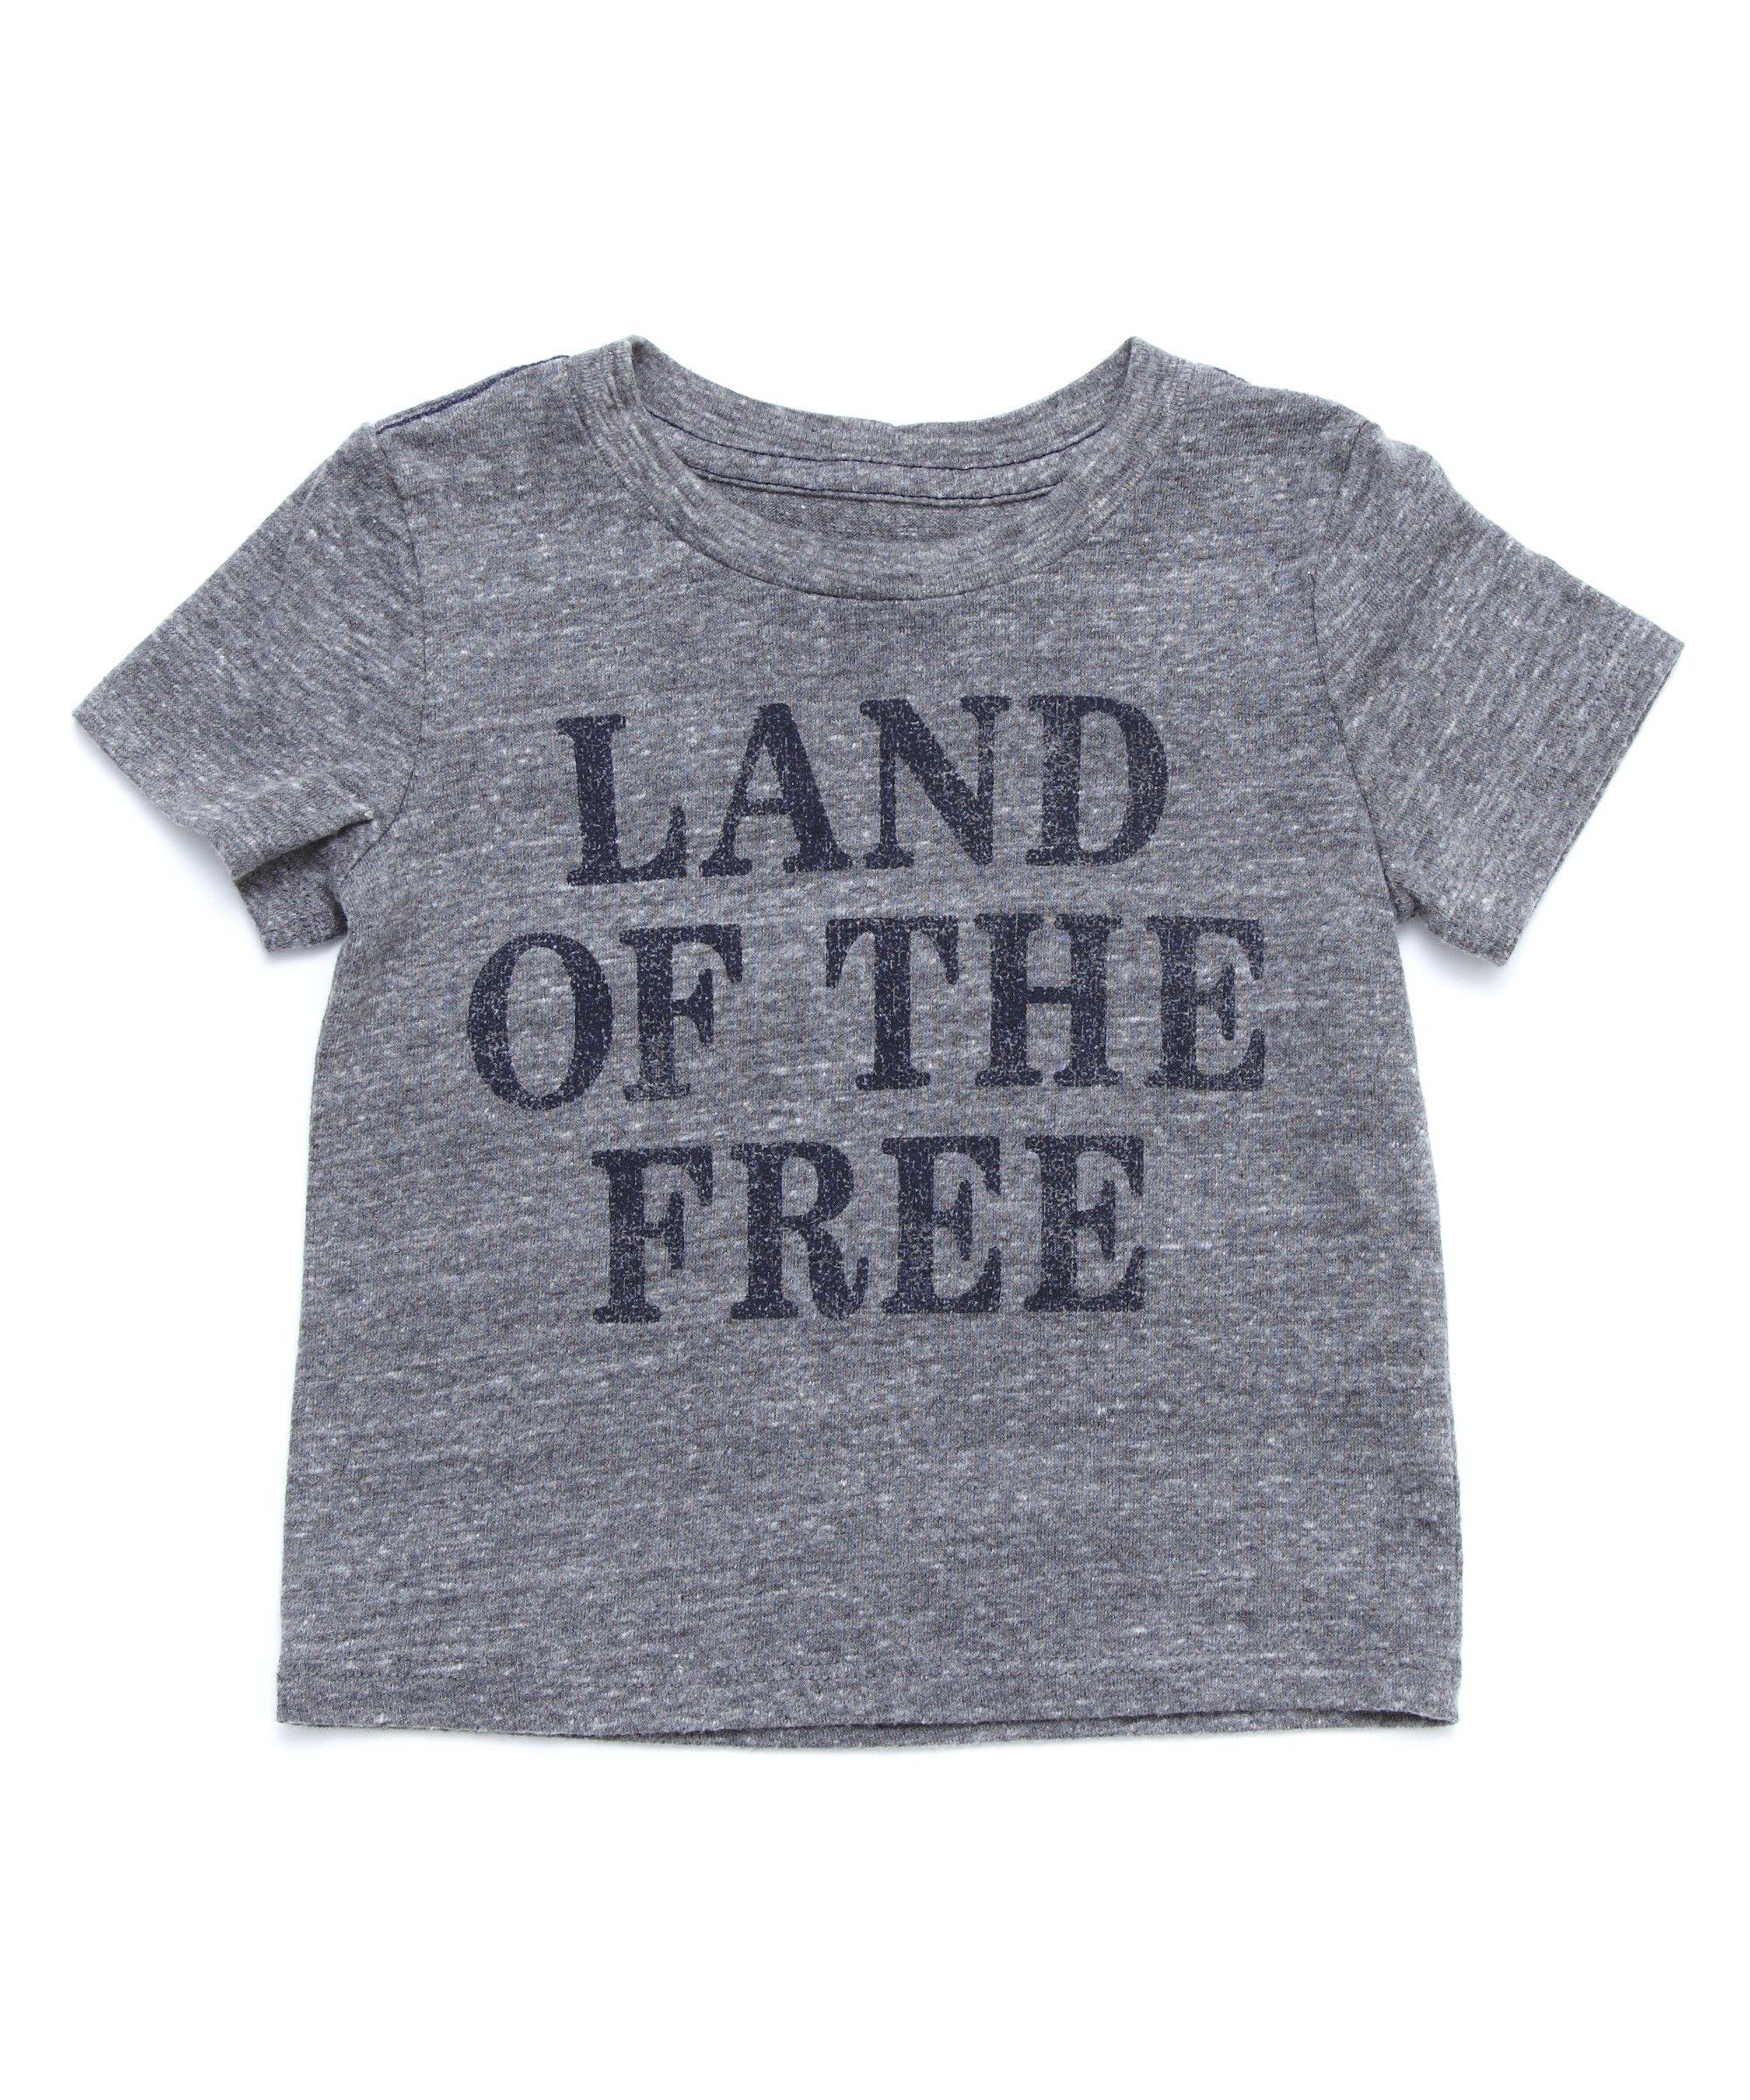 2fcbf04de9400 Baby Land of the Free - New In - Browse - baby boys | Peek Kids ...